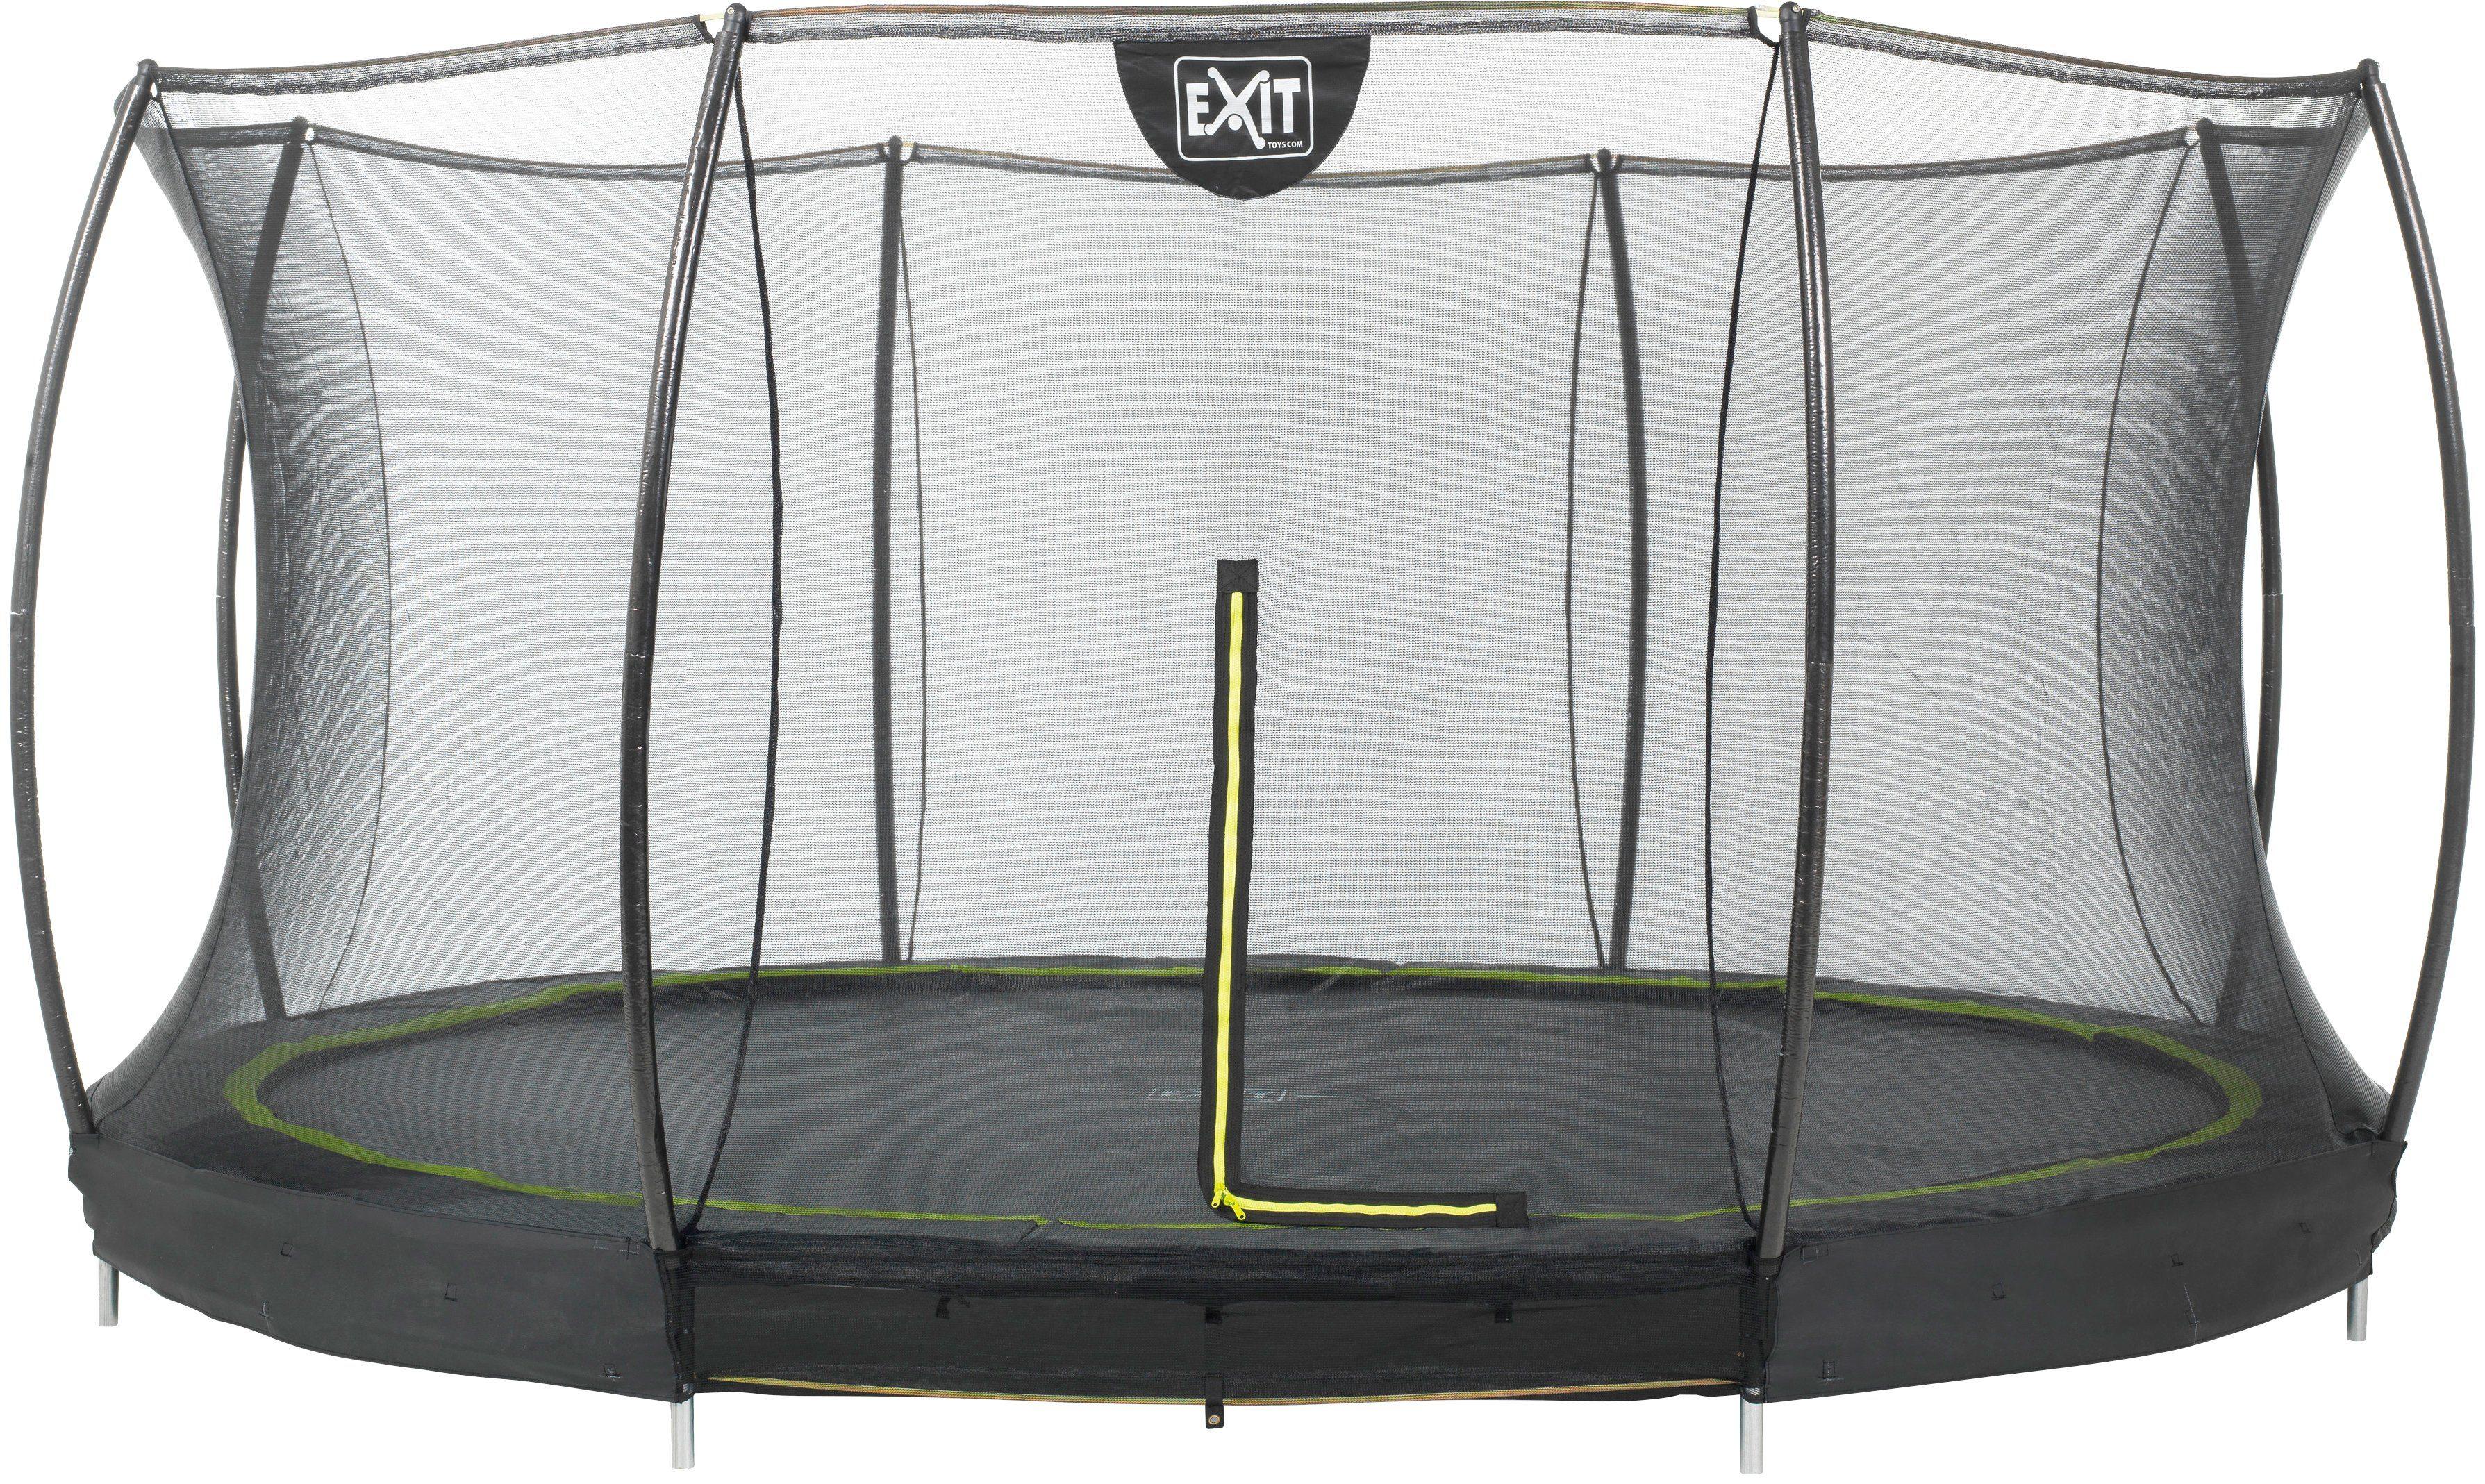 EXIT Trampolin »Silhouette Ground«, Ø: 427 cm